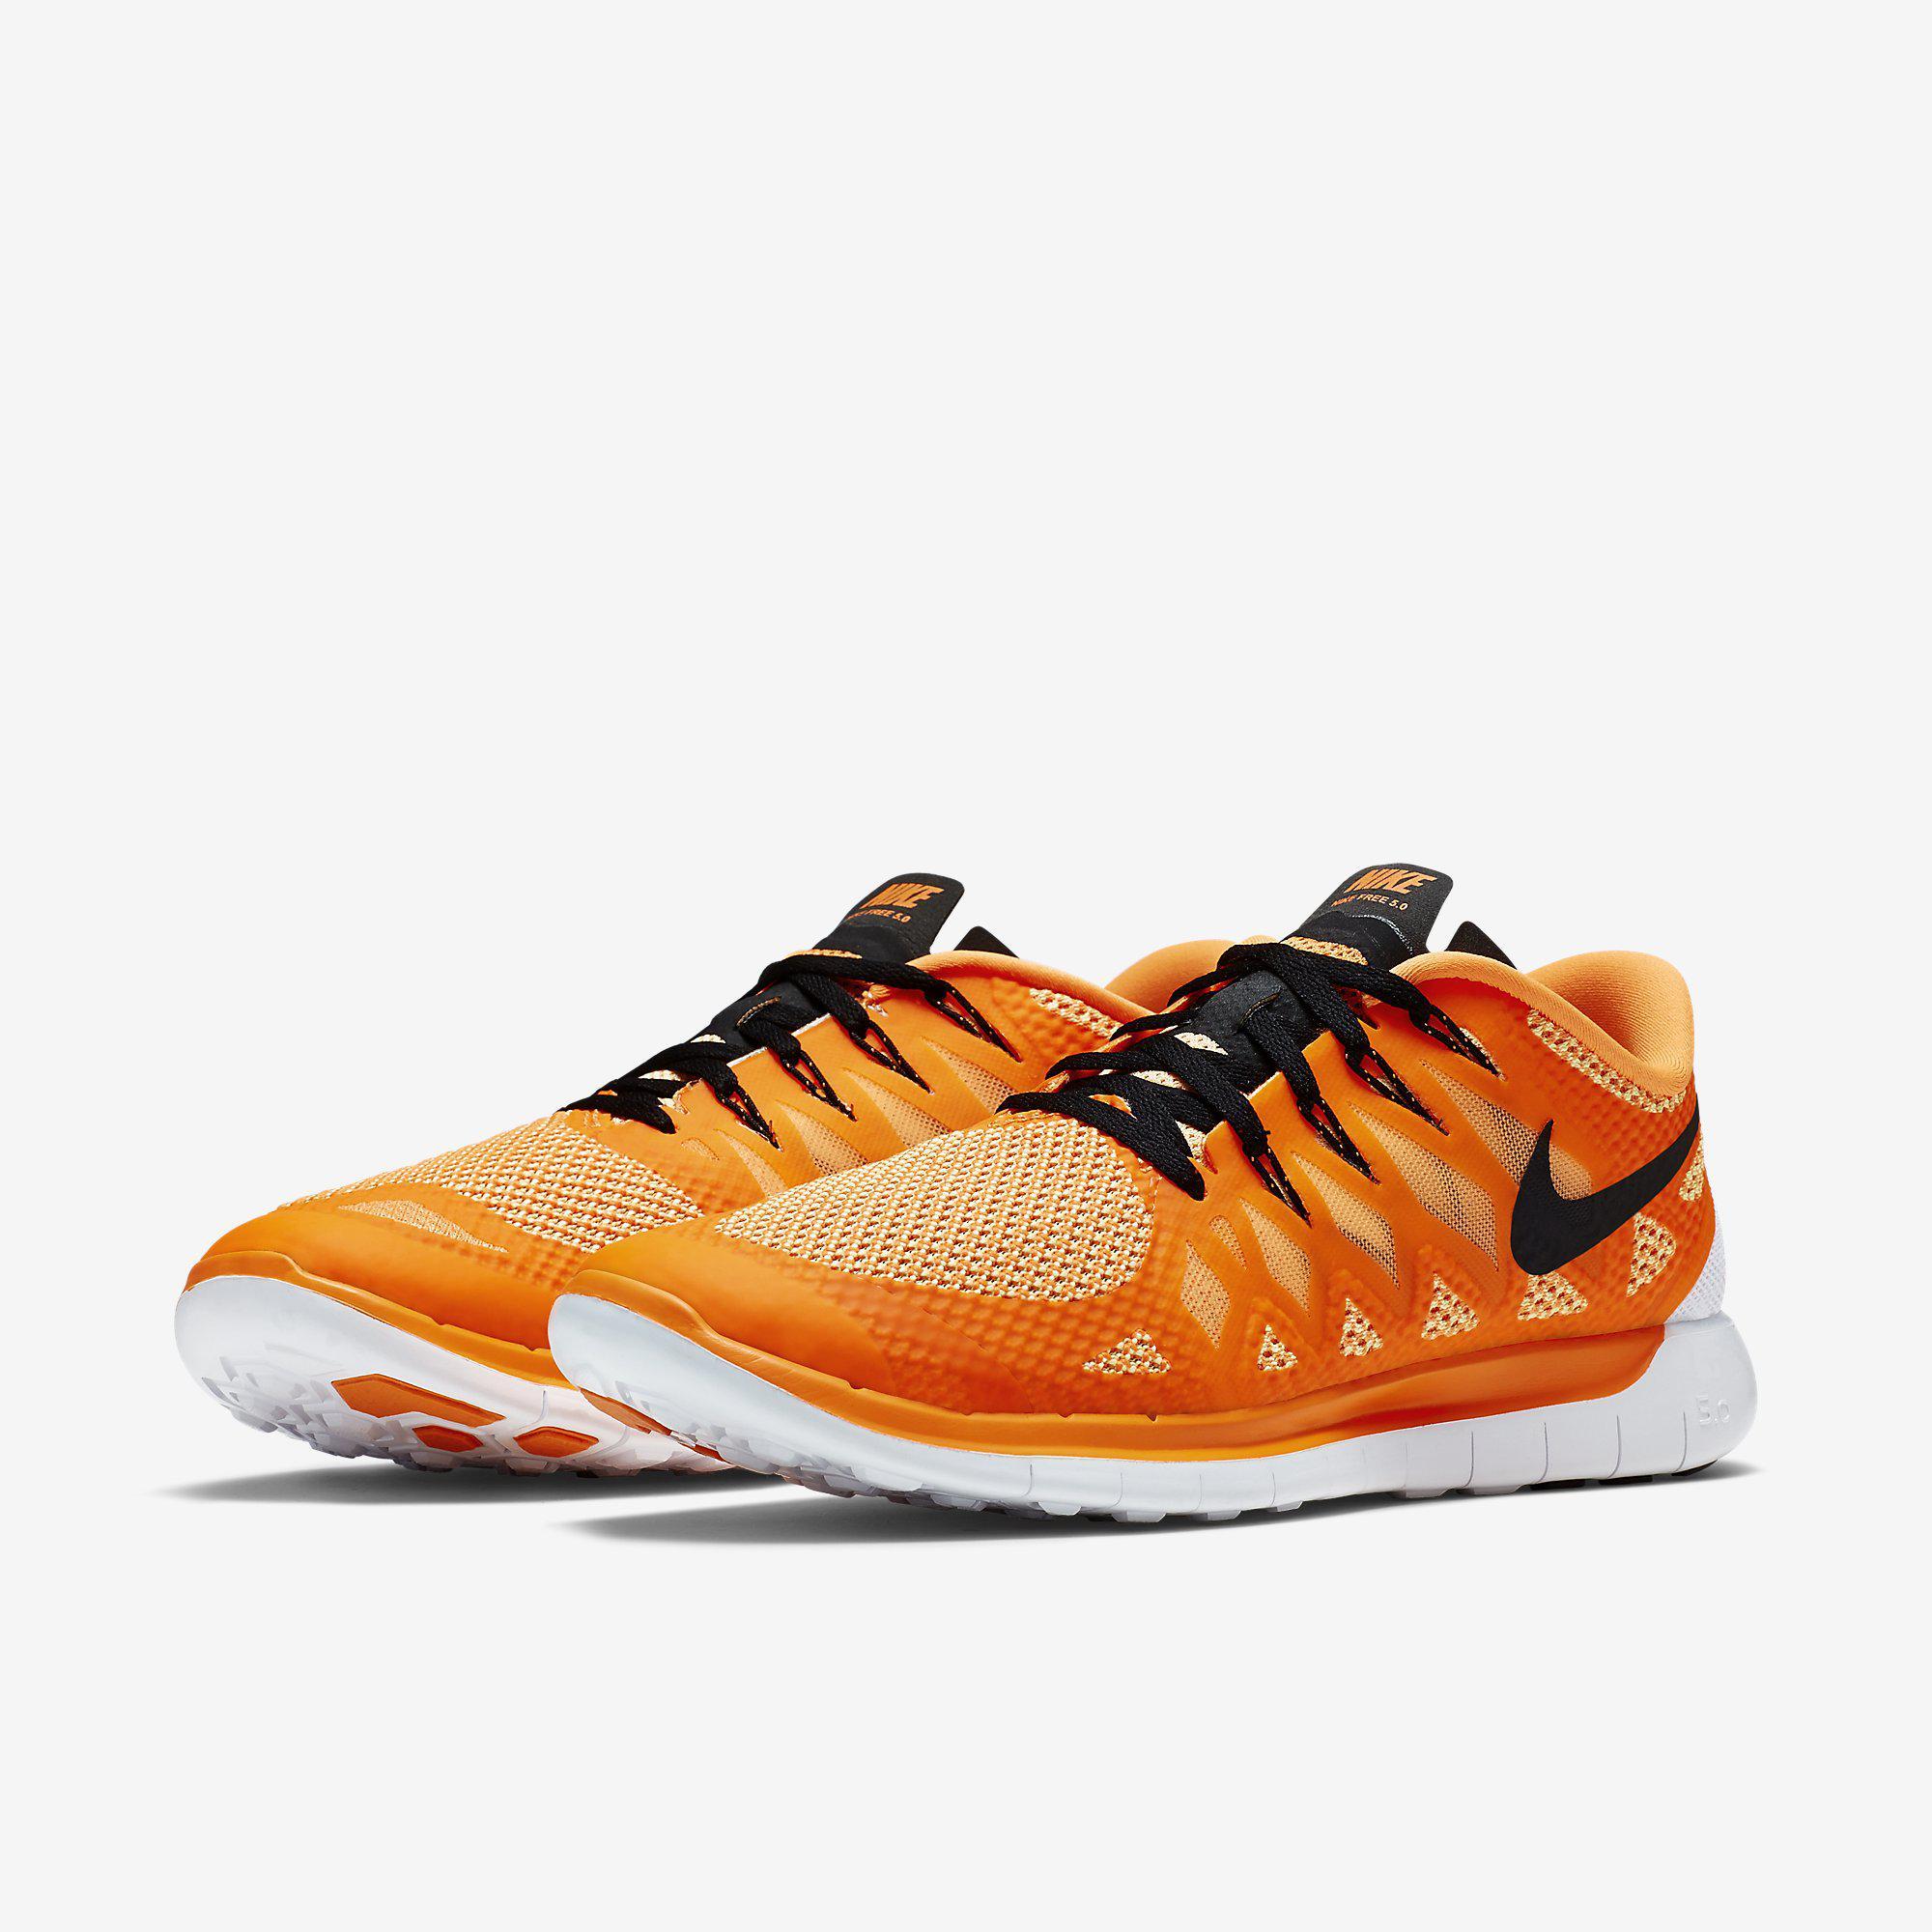 Out Of Stock Nike Mens Free 50 Running Shoes  Orange Black